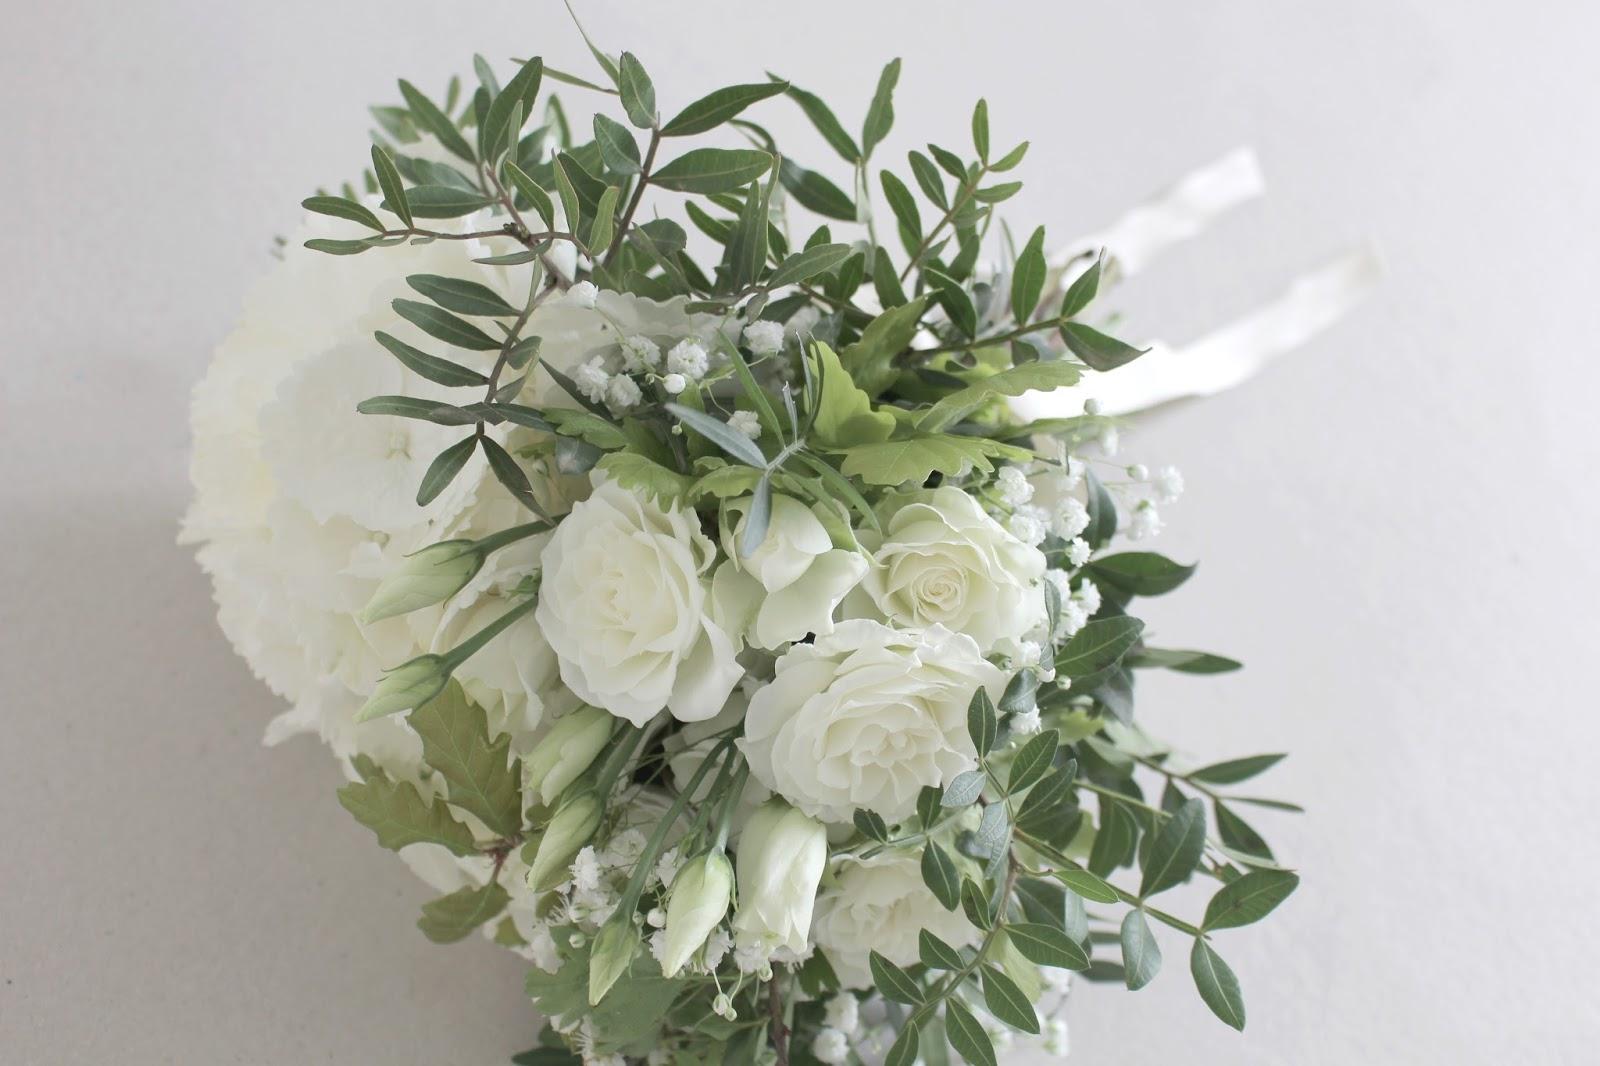 la petite boutique de fleurs fleuriste mariage lyon fleuriste mariage rh ne mai 2016. Black Bedroom Furniture Sets. Home Design Ideas